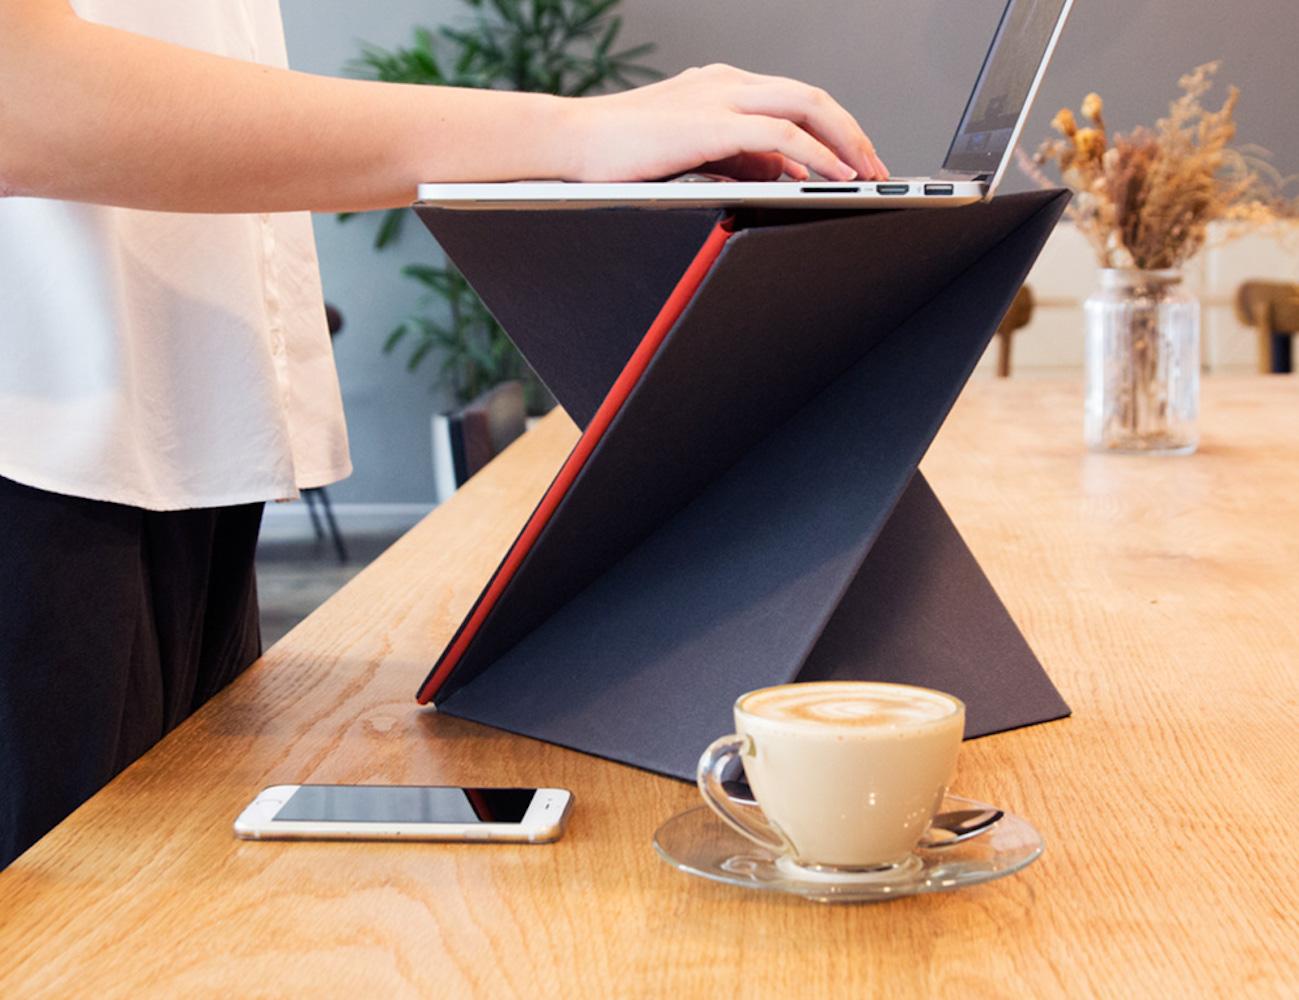 LEVIT8 – The Flat Folding Portable Standing Desk